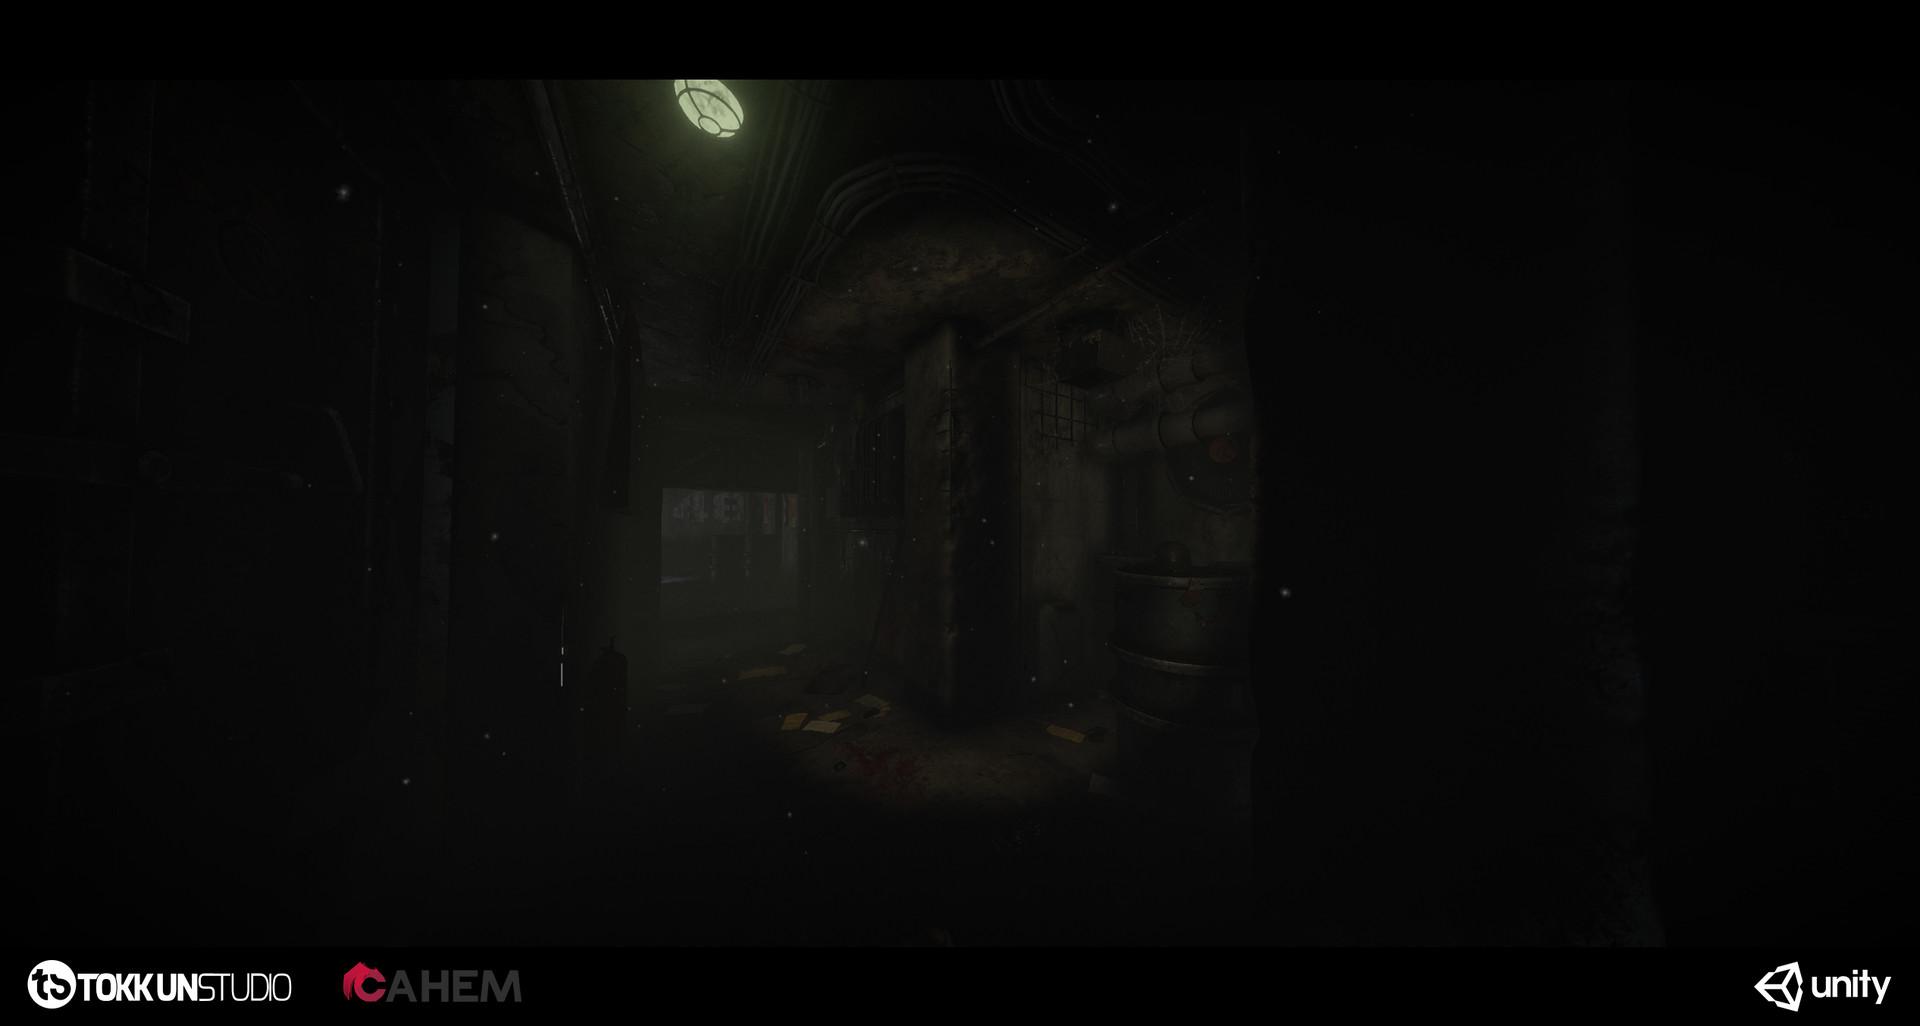 Tokkun studio bunker shot 05